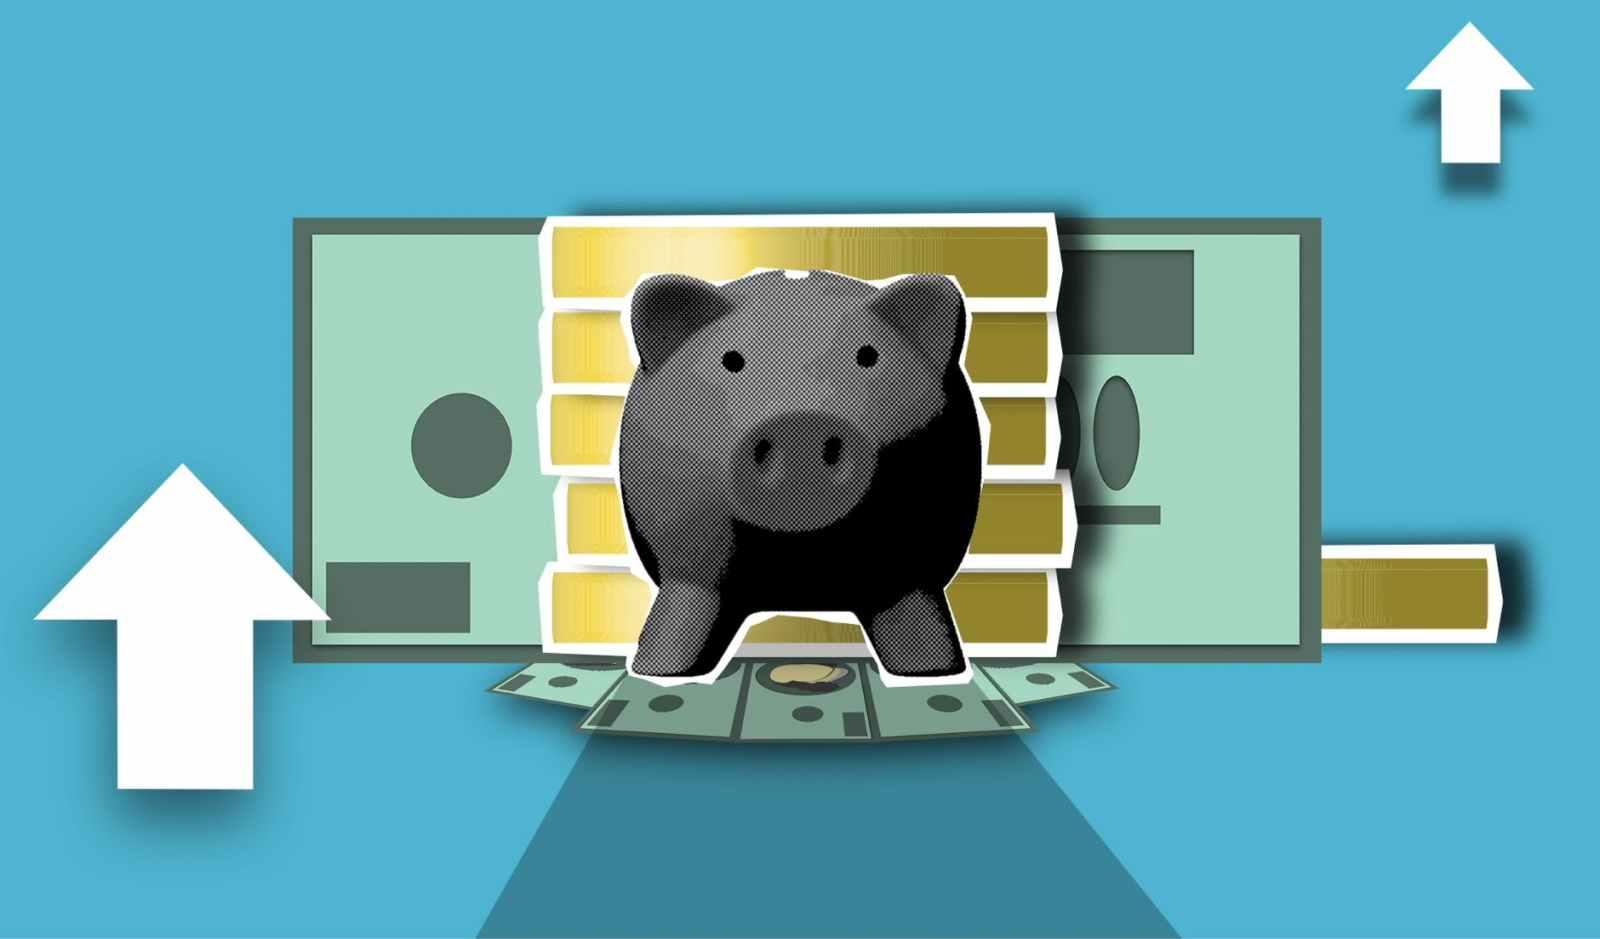 decorative illustration of money box and arrows